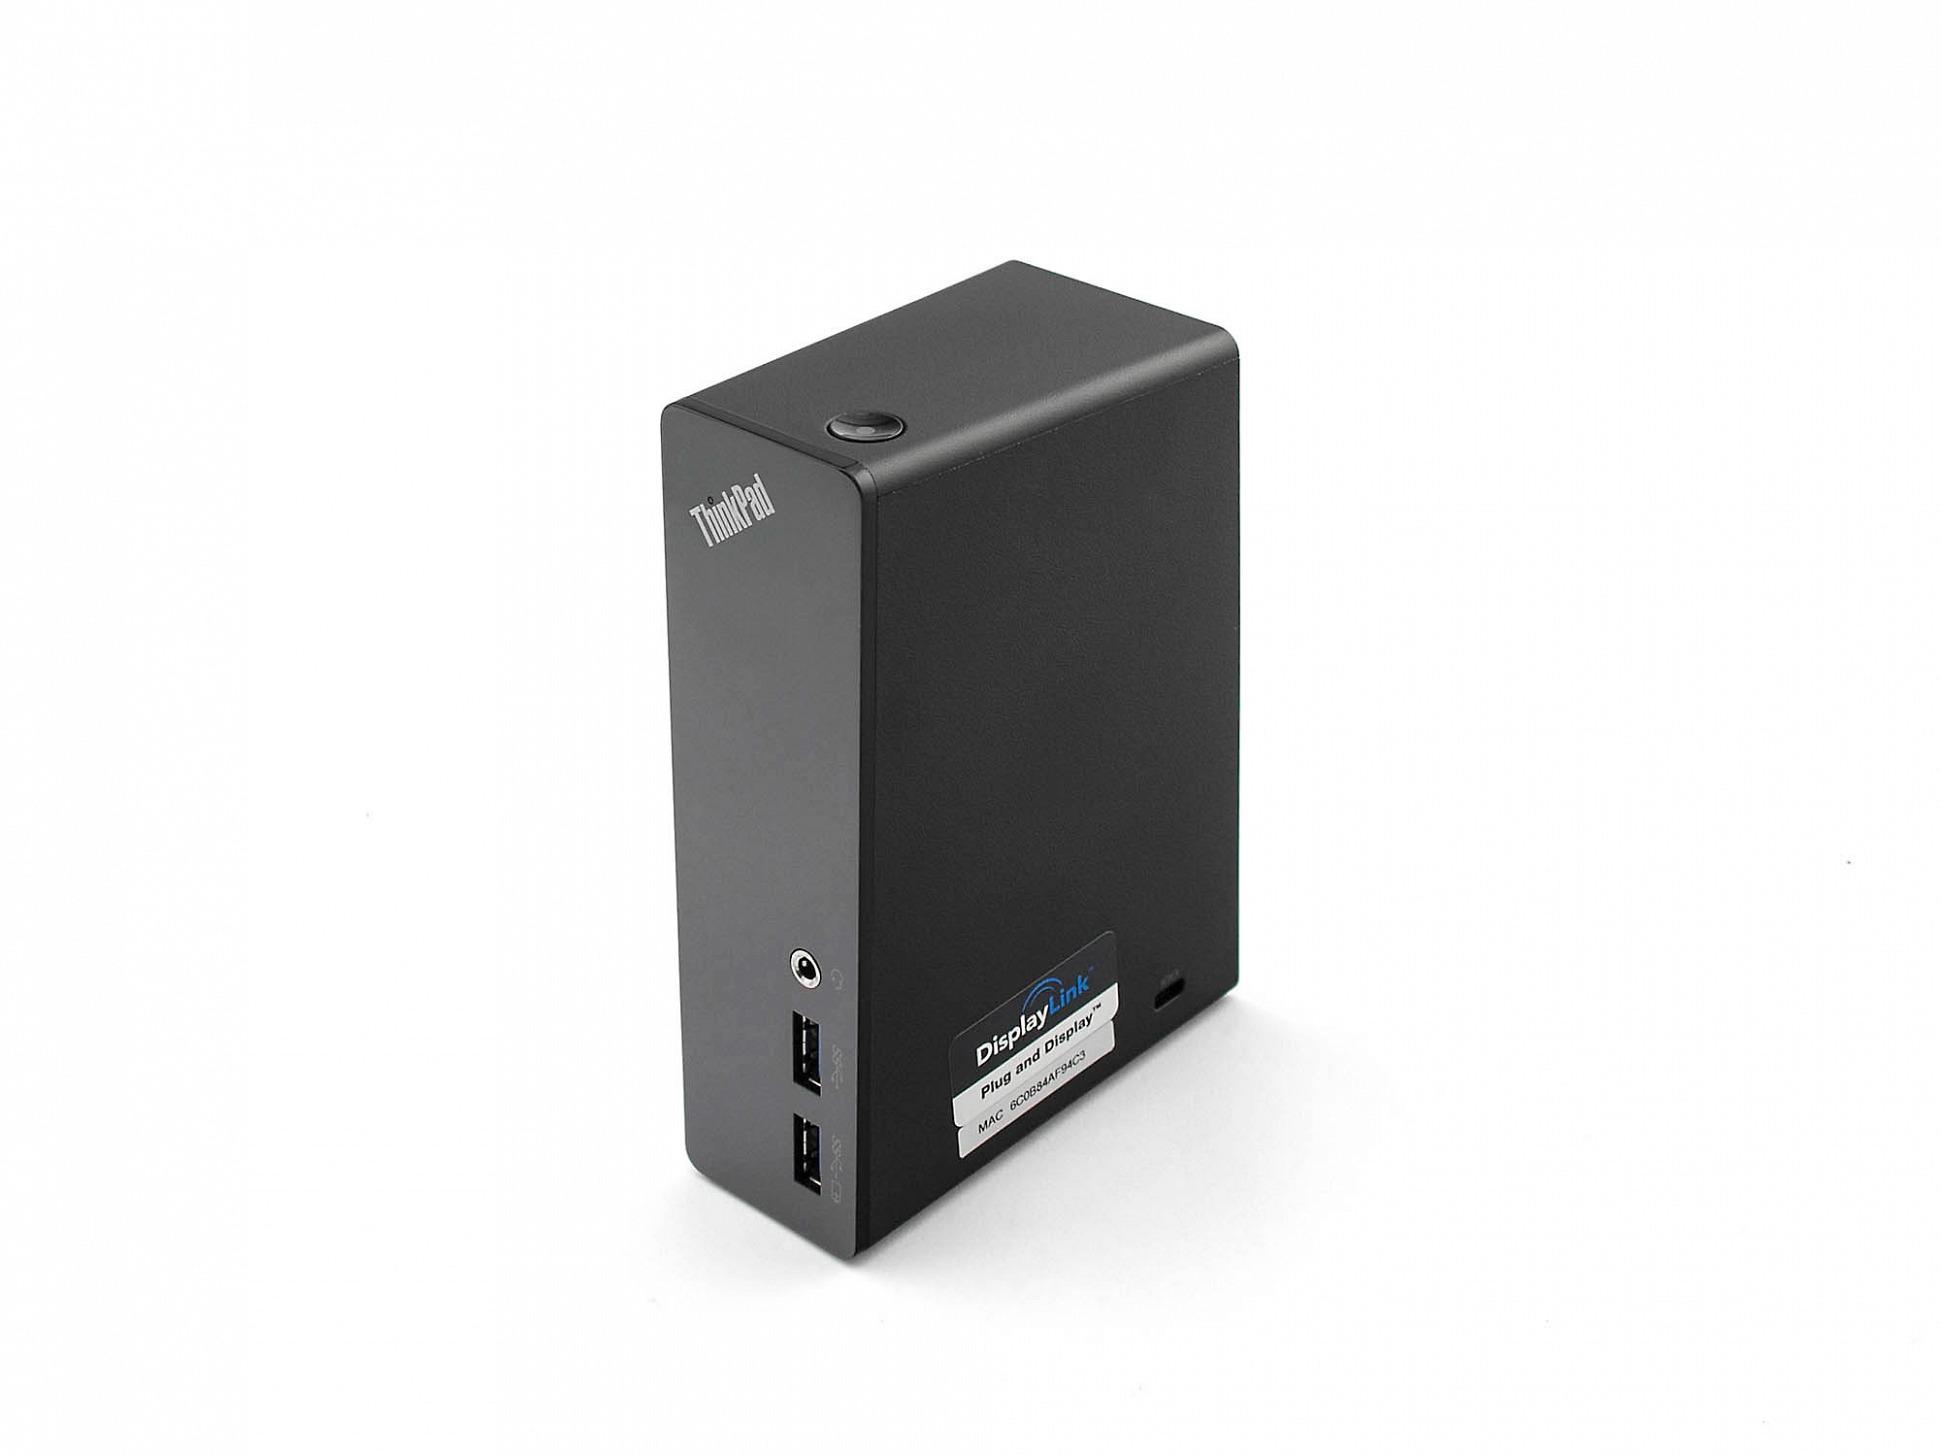 Universal Port Replikator Lenovo Basic Dock für Fujitsu Amilo Li-3910 Reg.No. EF9